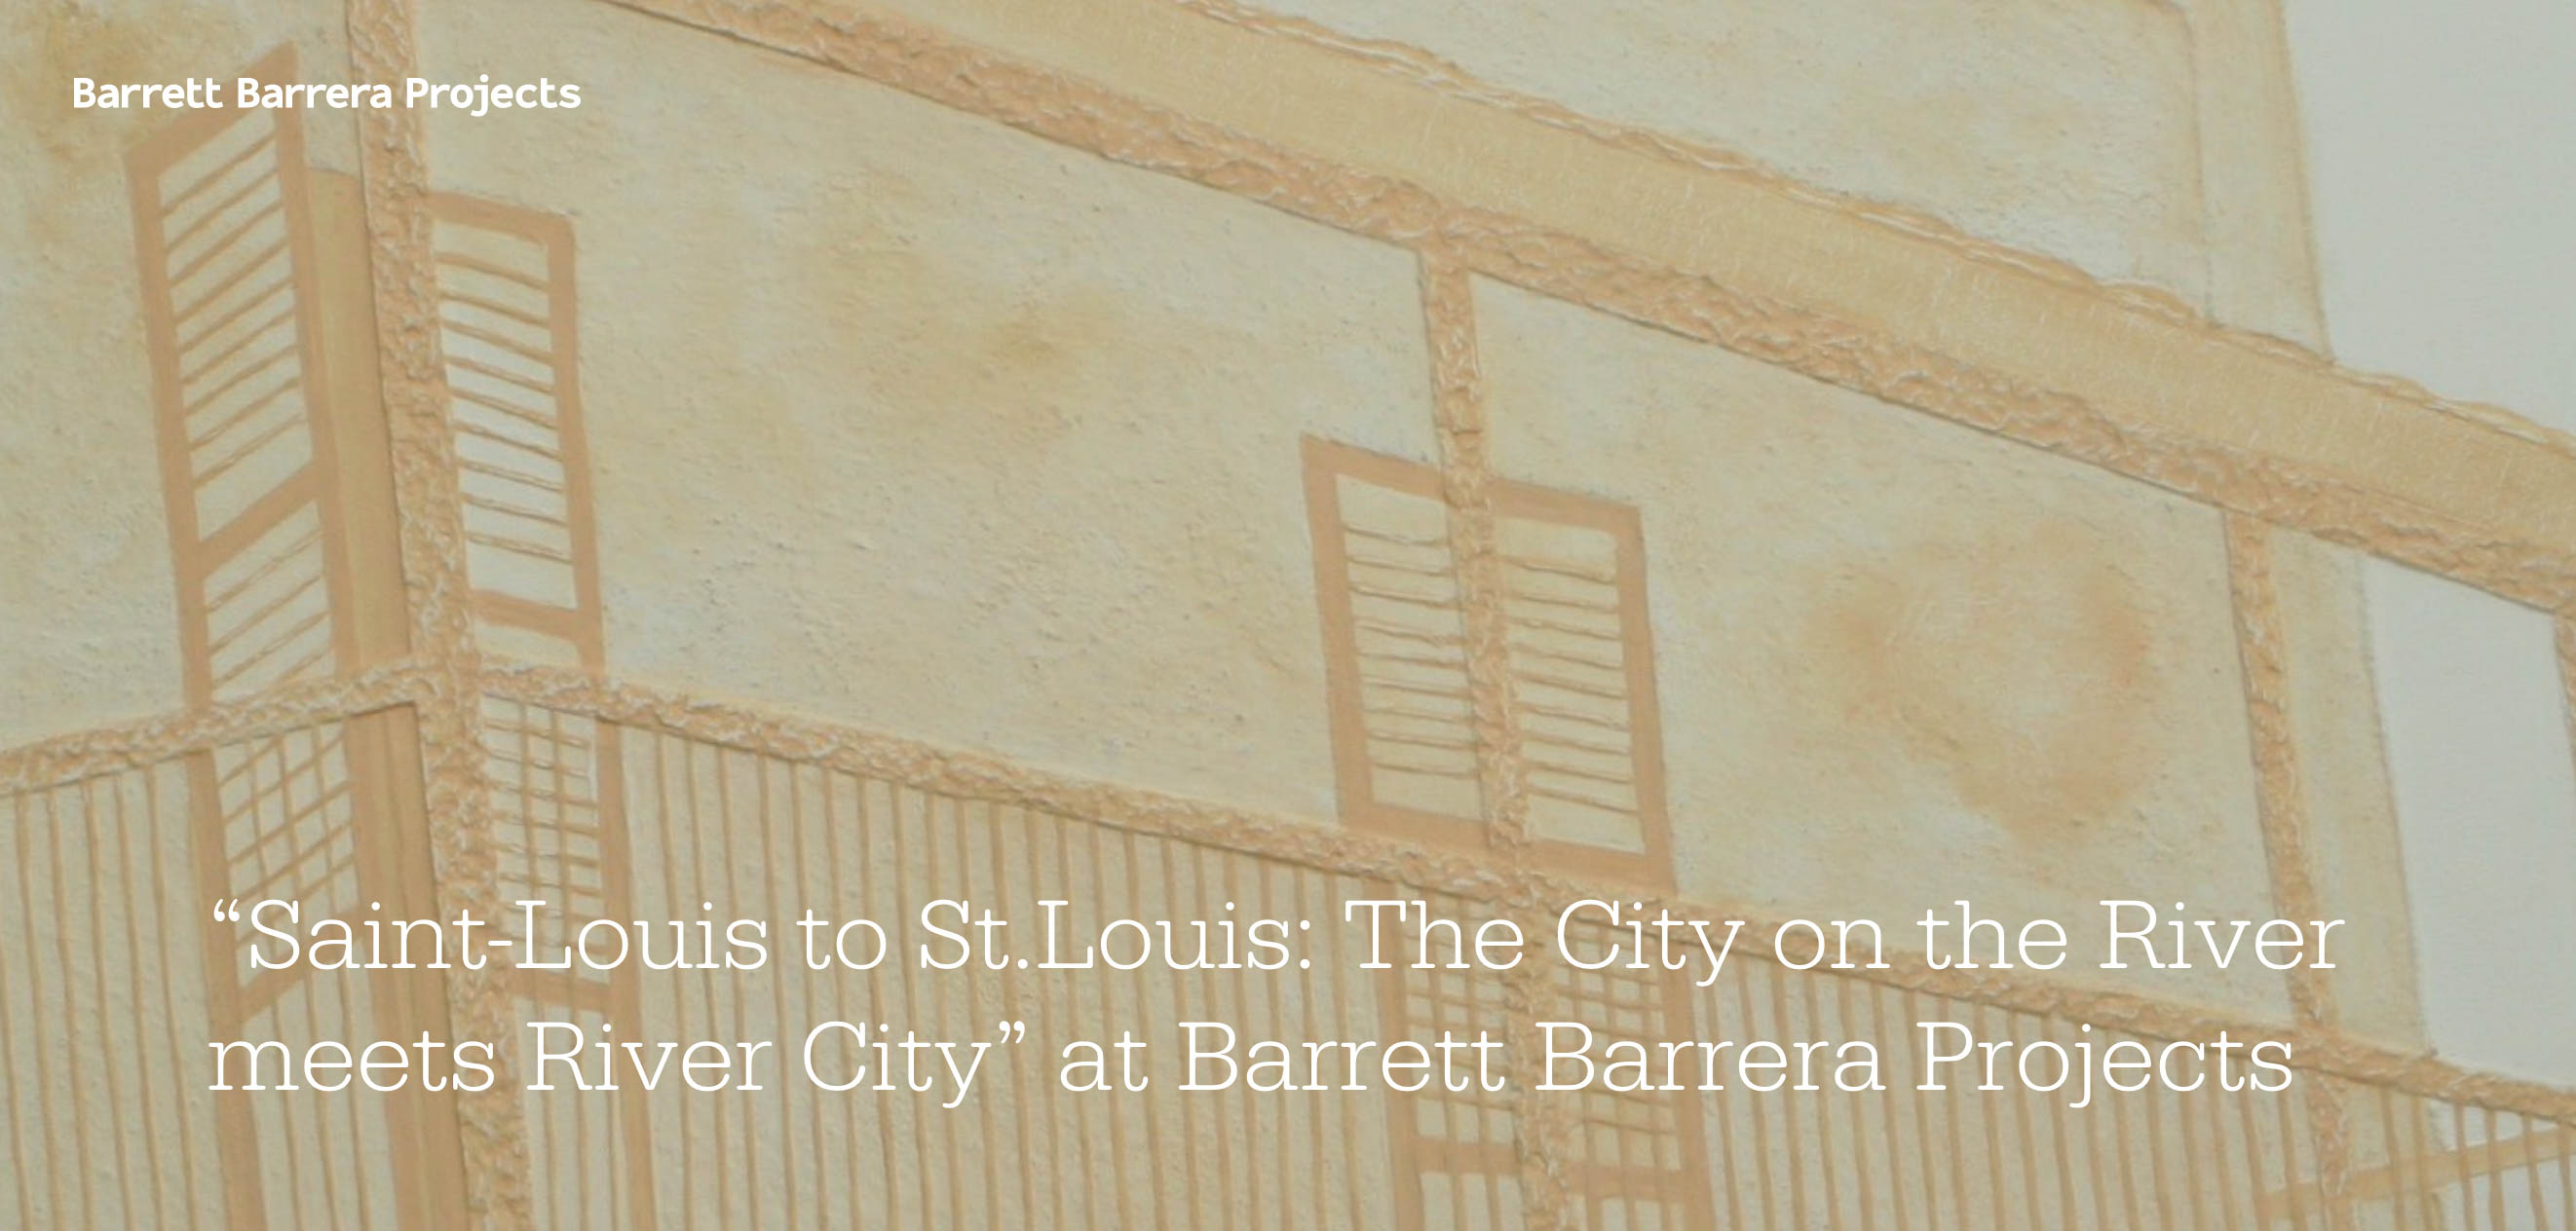 BarrettBarrera poster